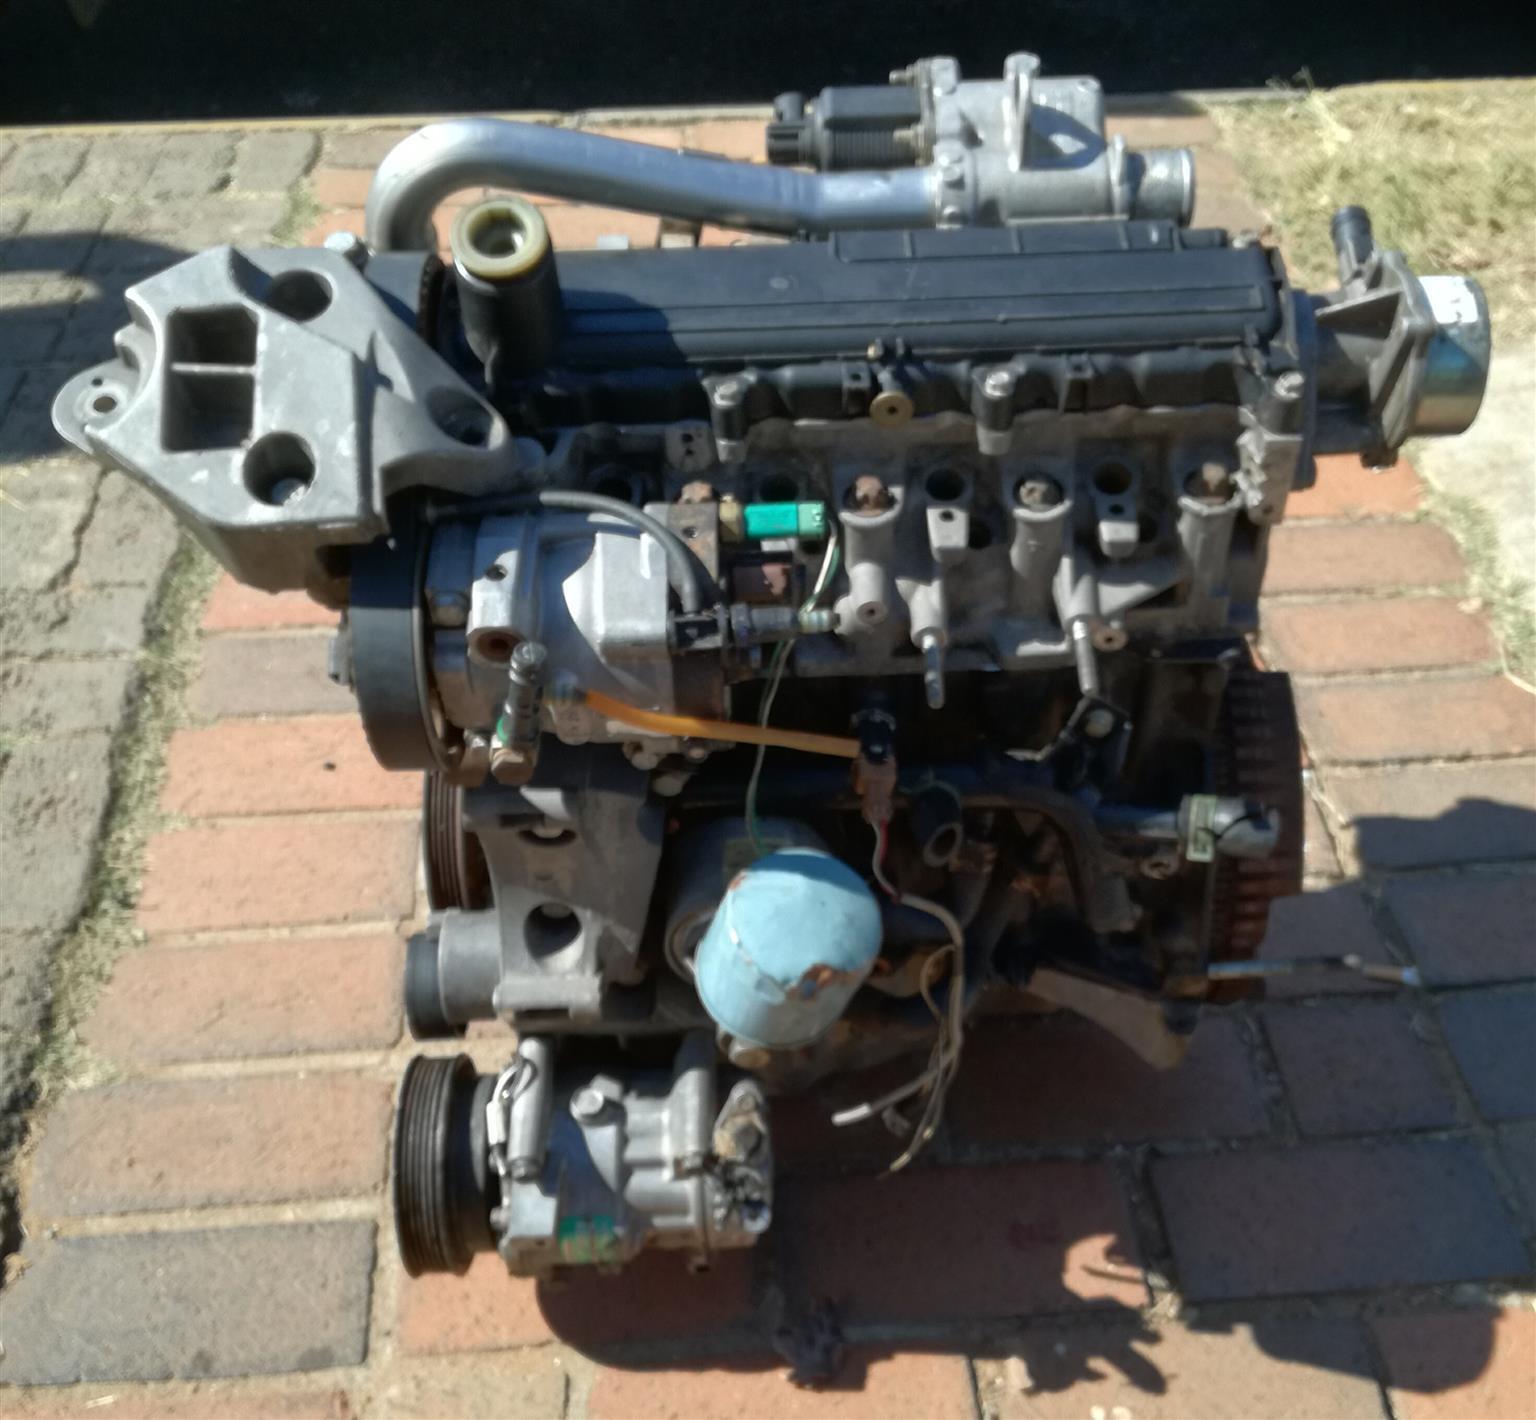 Nissan Micra 06 13 15 Dci K9ka704 Diesel Engine Junk Mail Chain Timing Tensioner Gear For Mitsubishi Pajero Pickup Triton